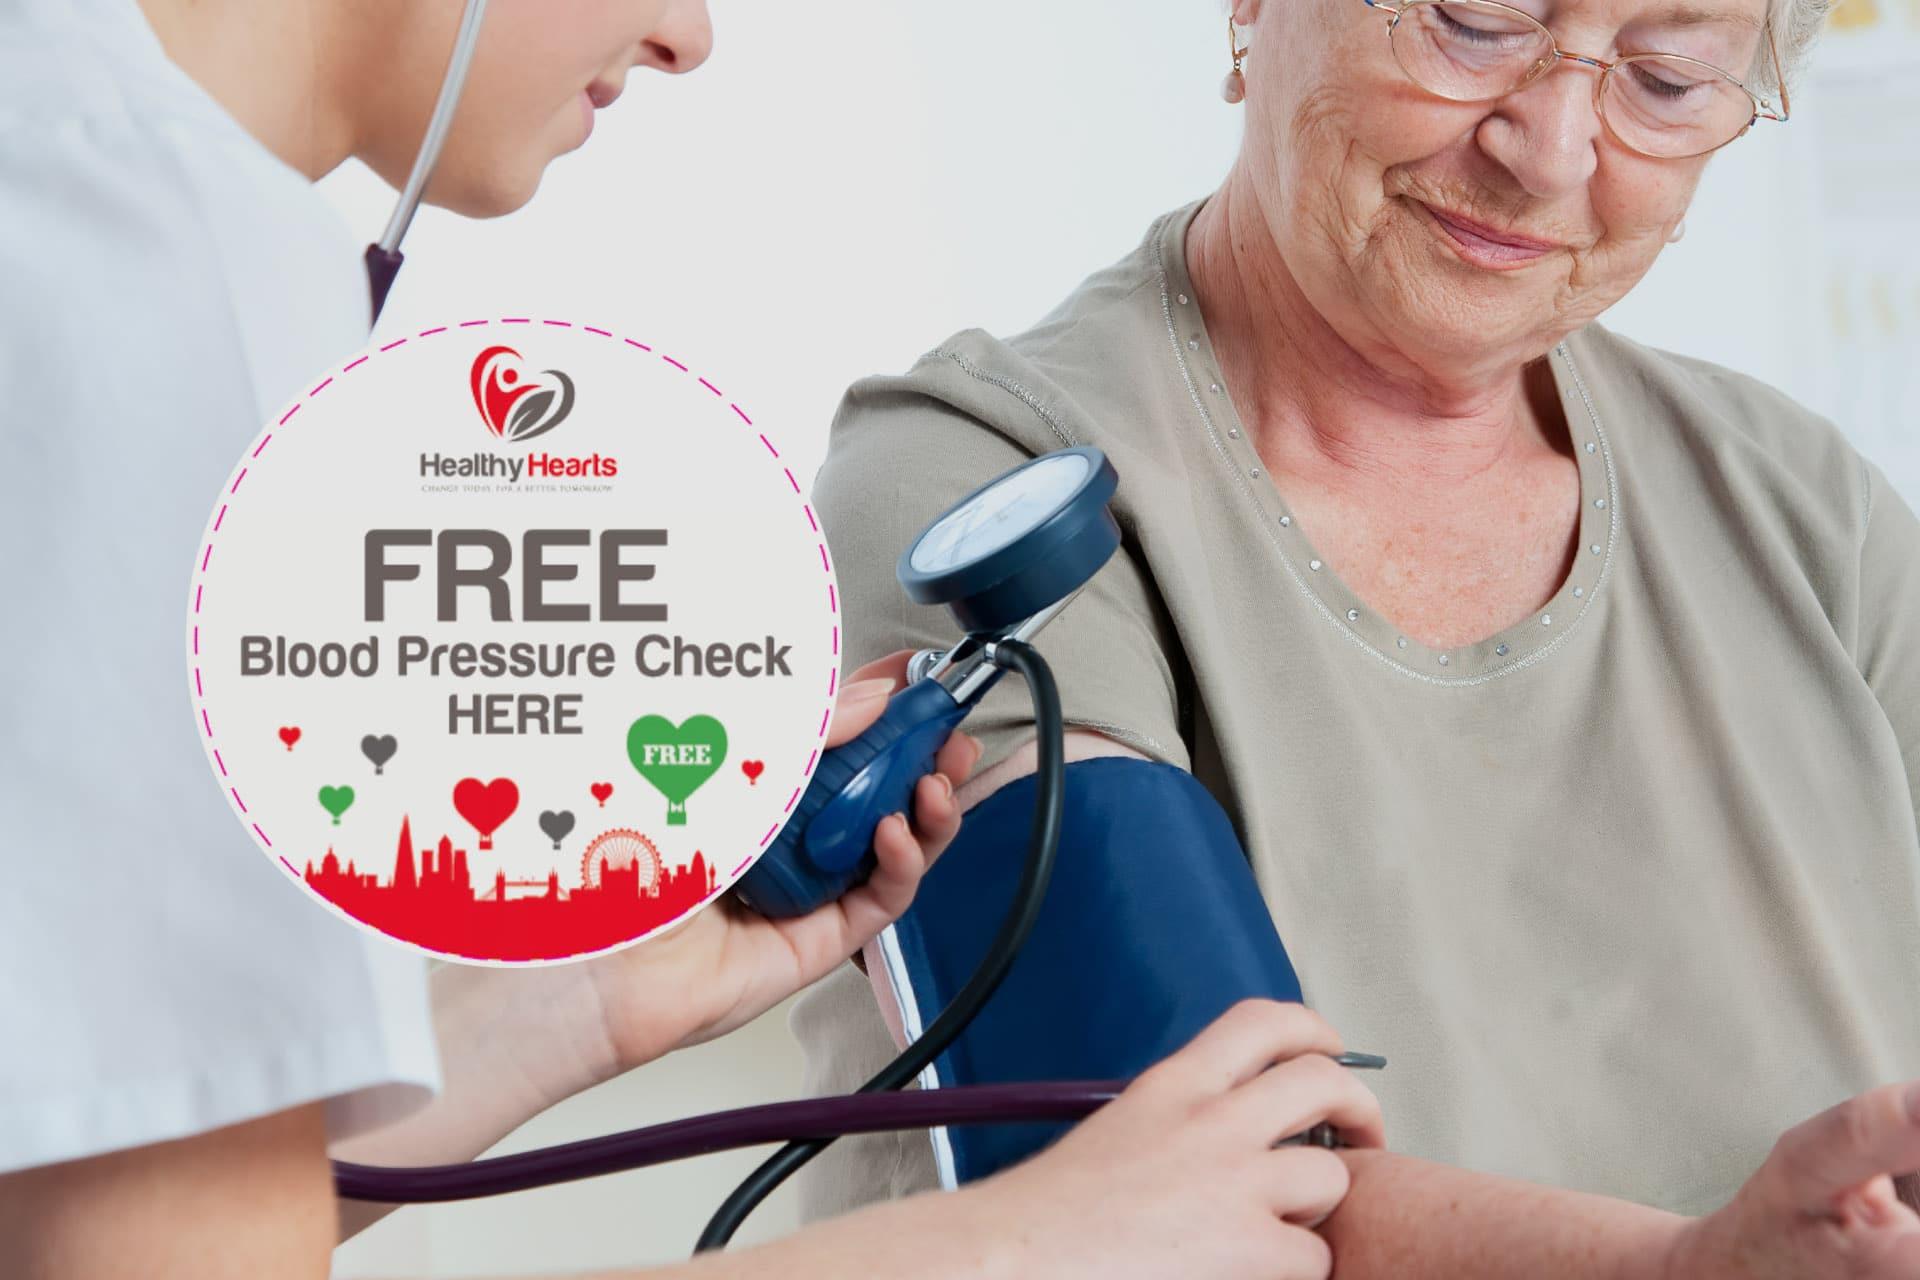 Free blood pressure test